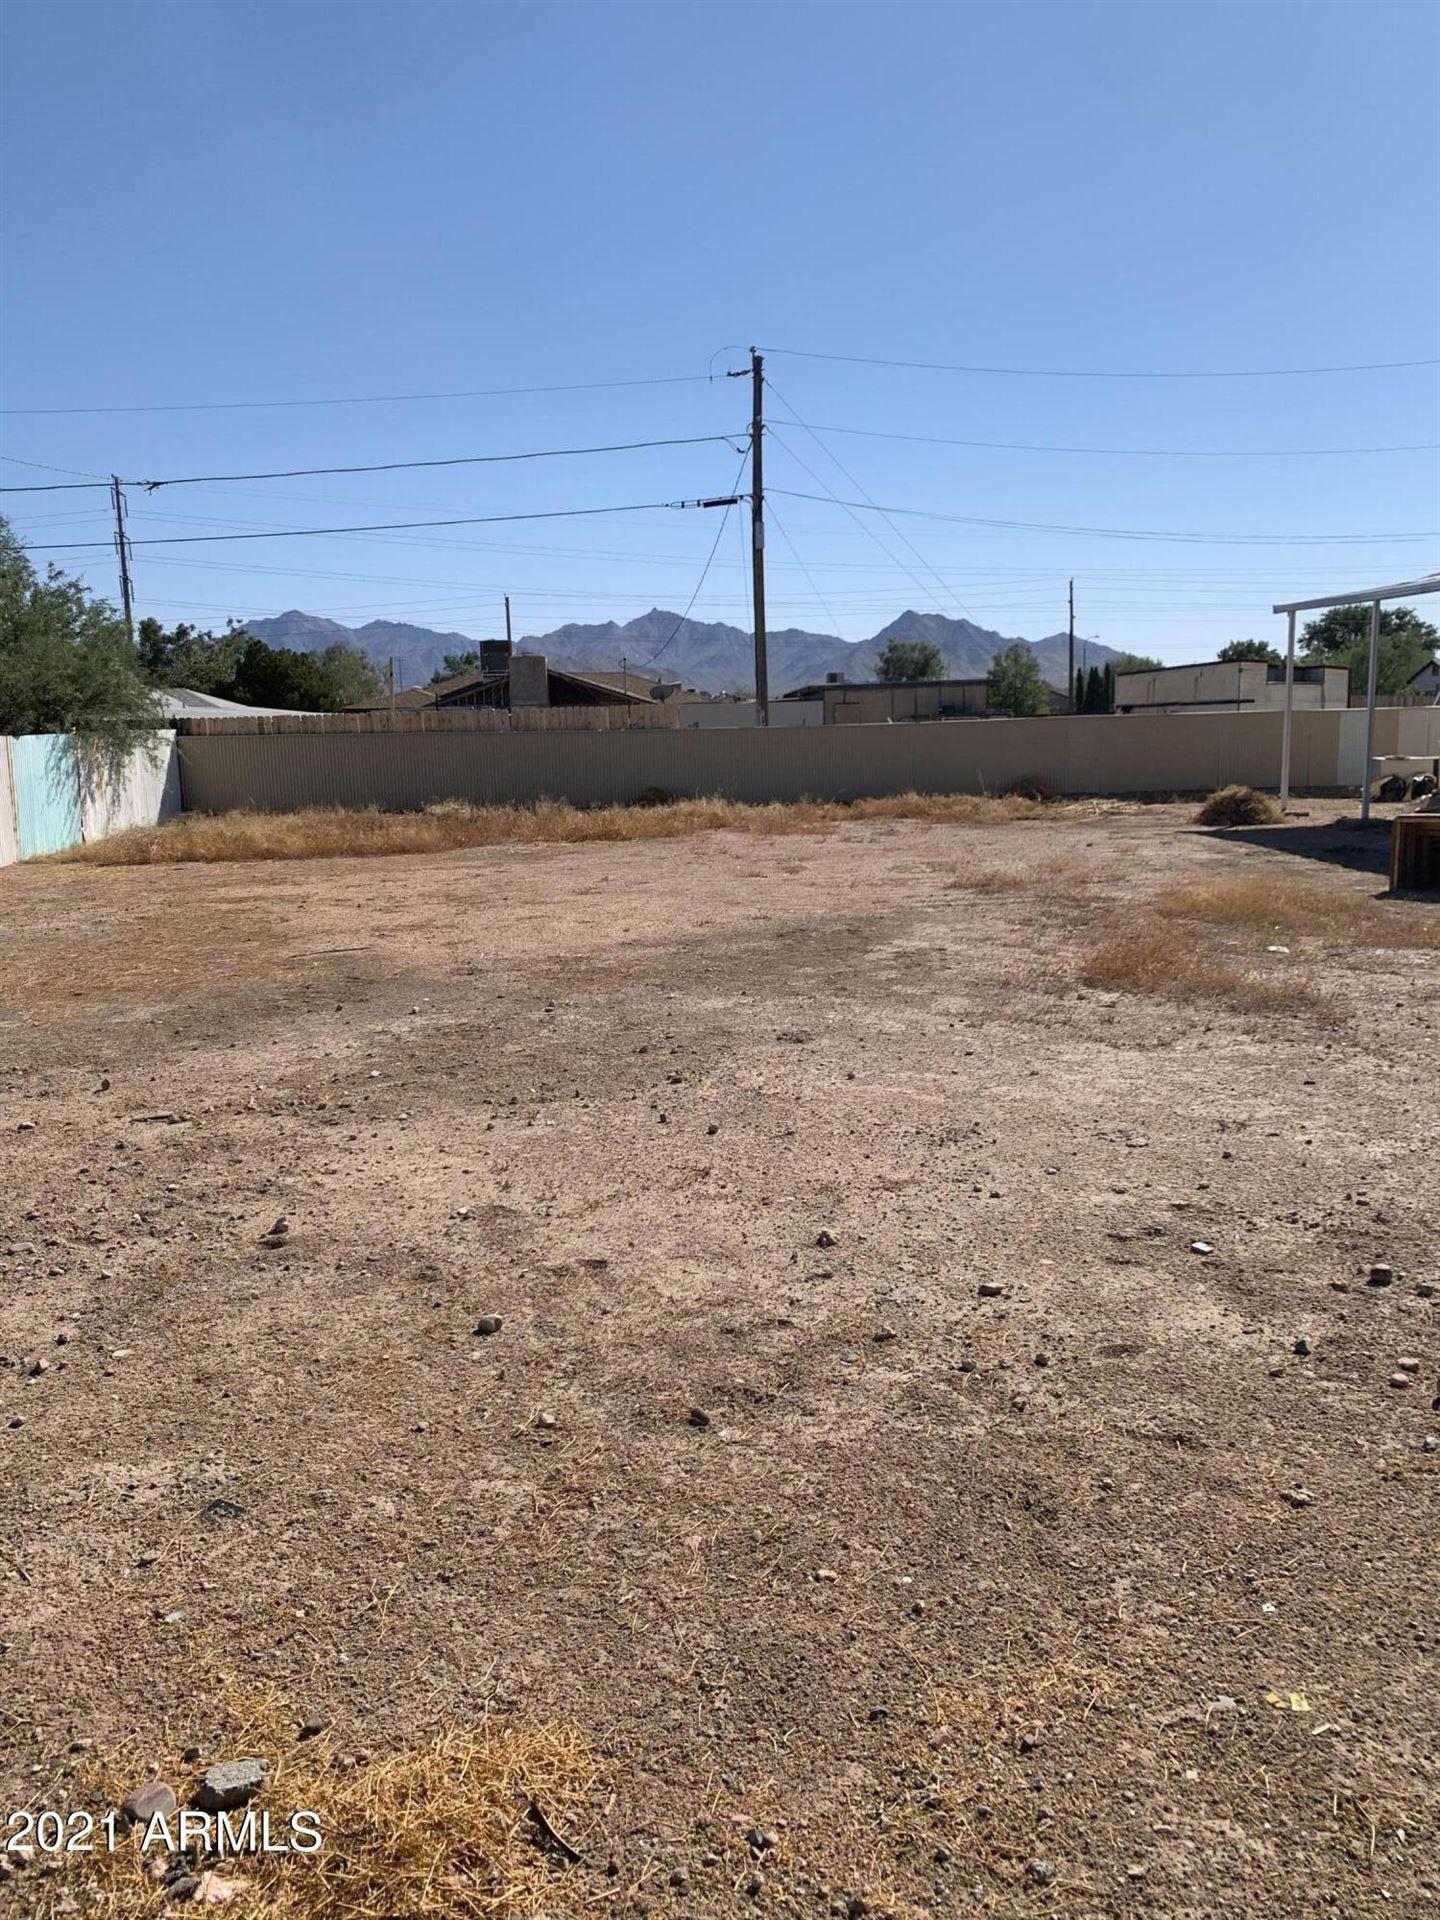 Photo of 12337 W FLORENCE Street, Avondale, AZ 85323 (MLS # 6306559)